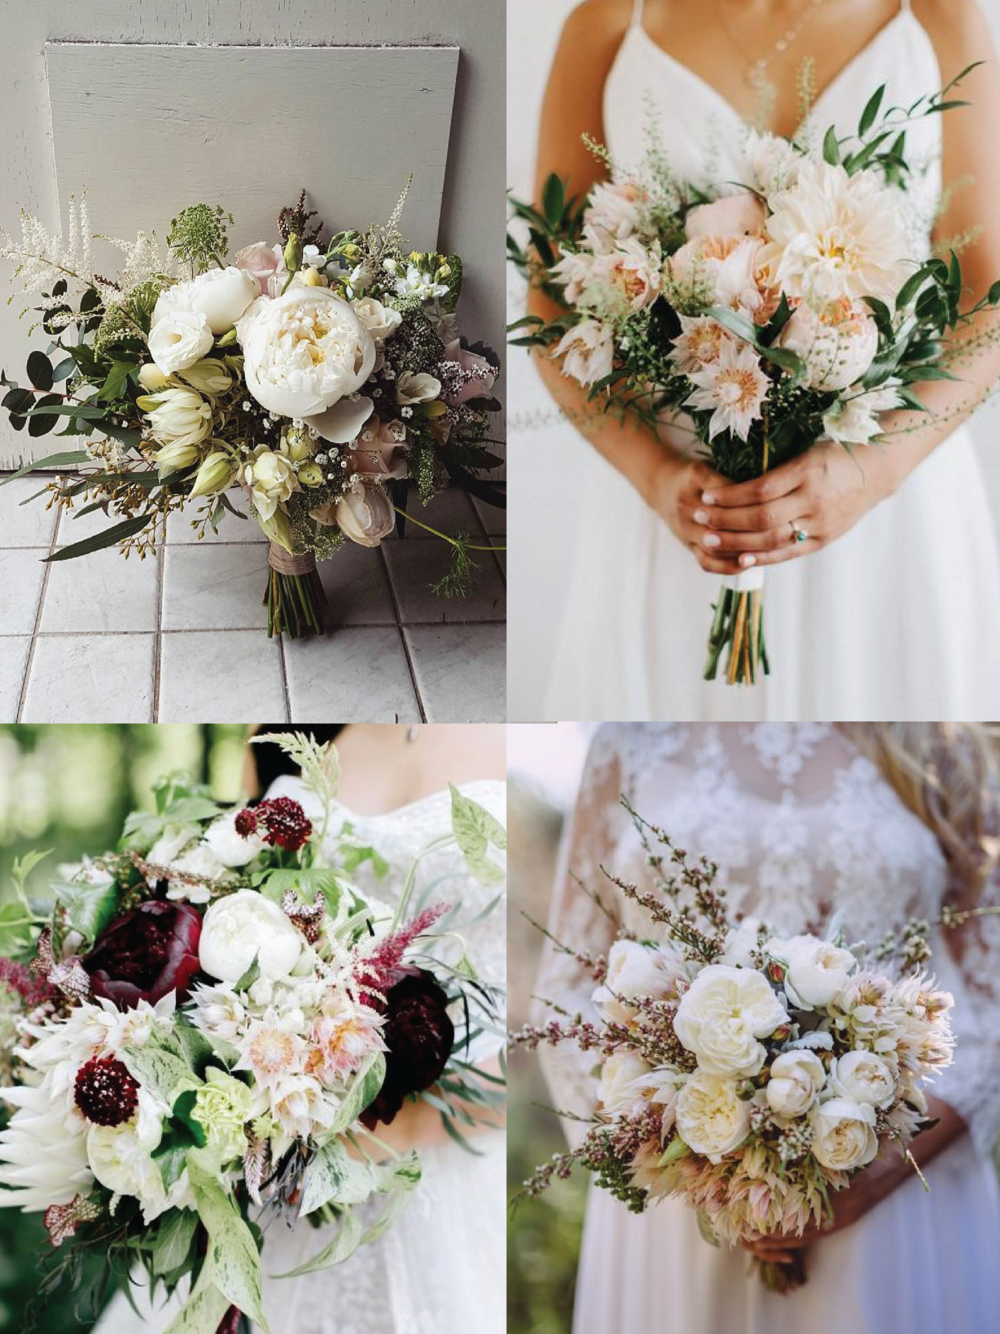 Winter Wedding Flowers.Winter Wedding Bouquet Blog Lime Tree Bower